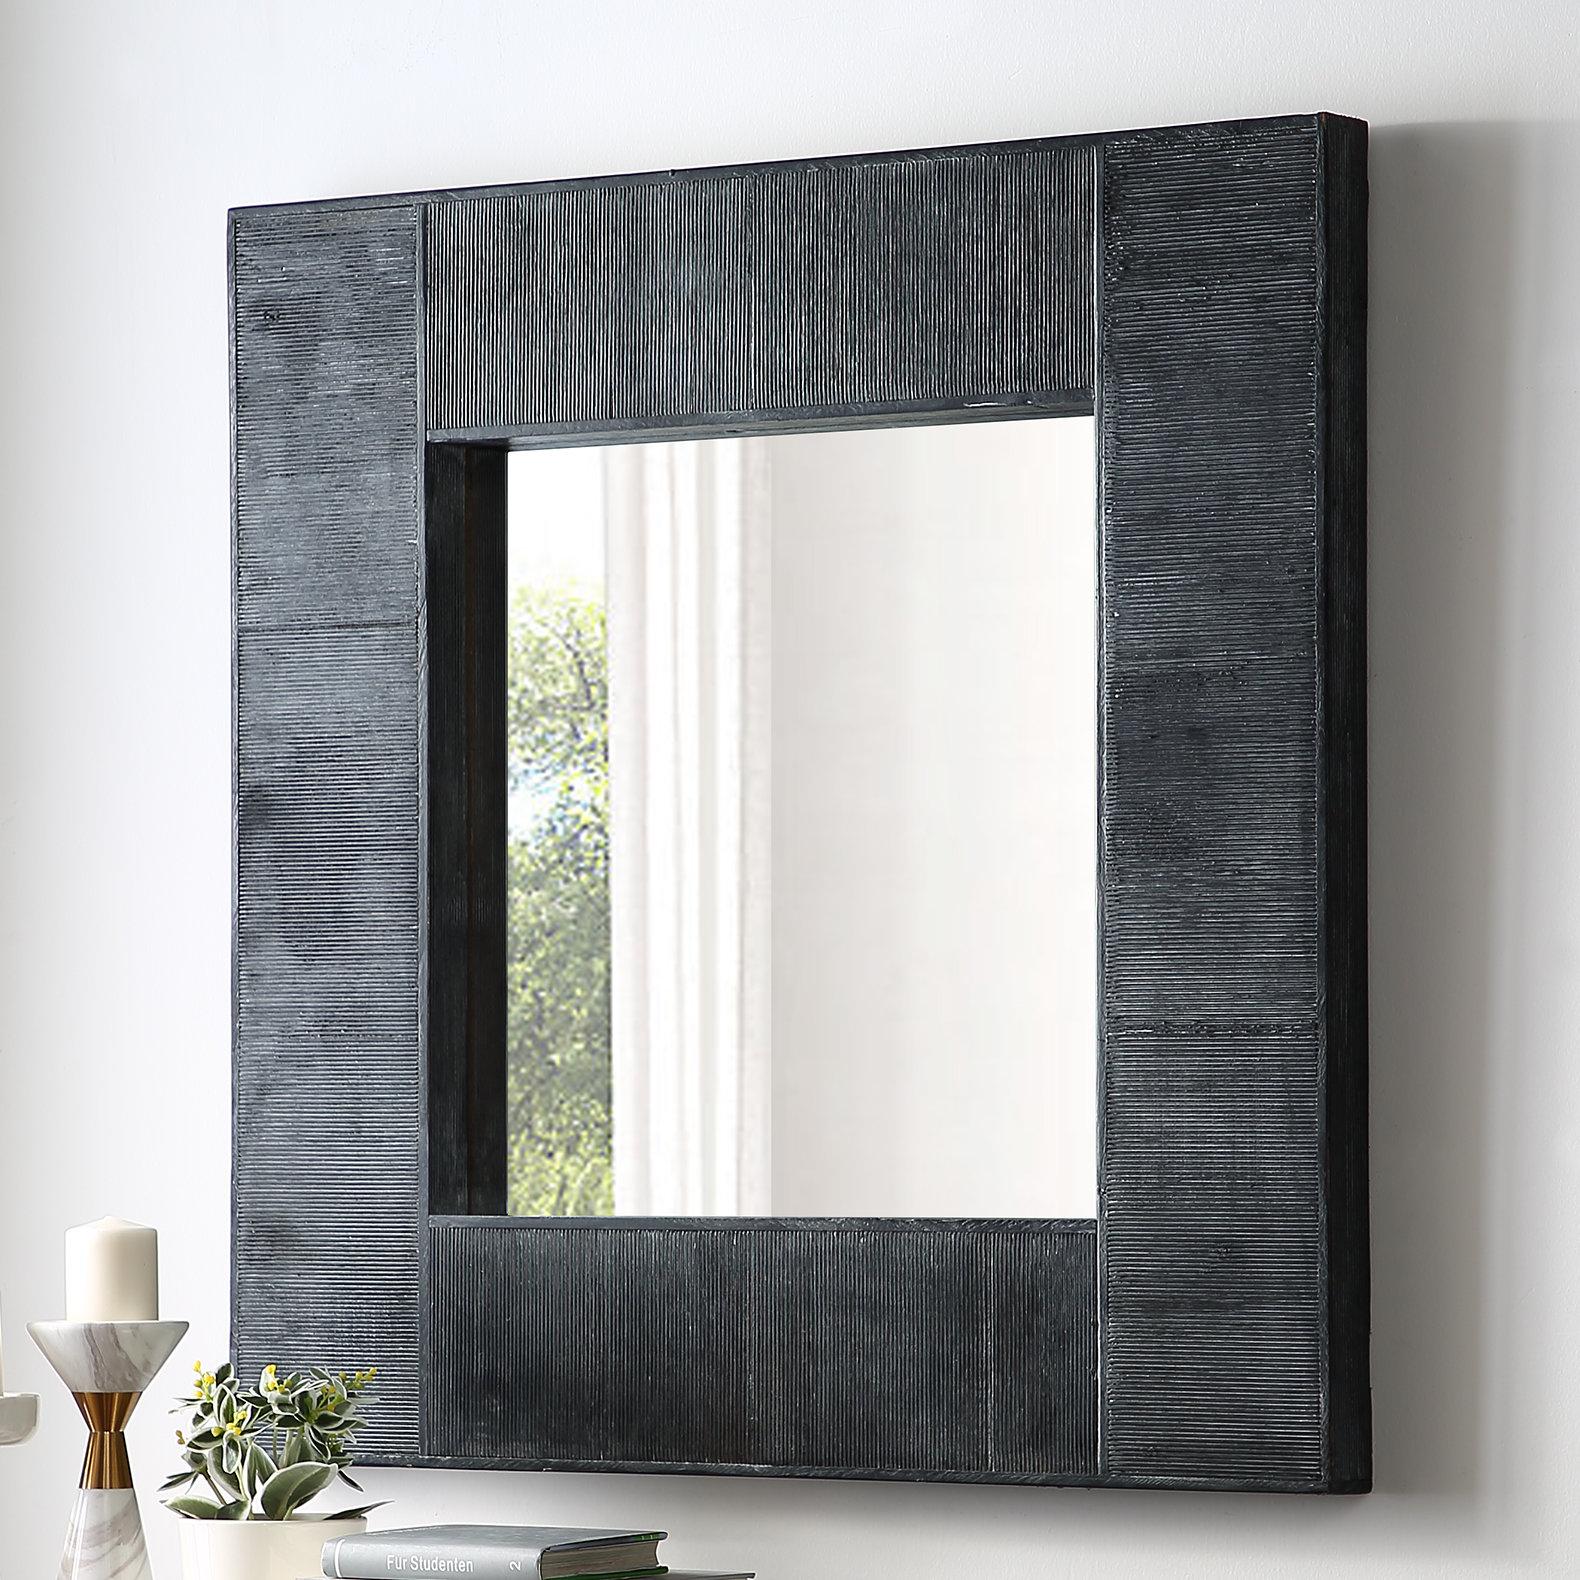 Elizebeth Accent Mirror Inside Rena Accent Mirrors (Image 9 of 20)